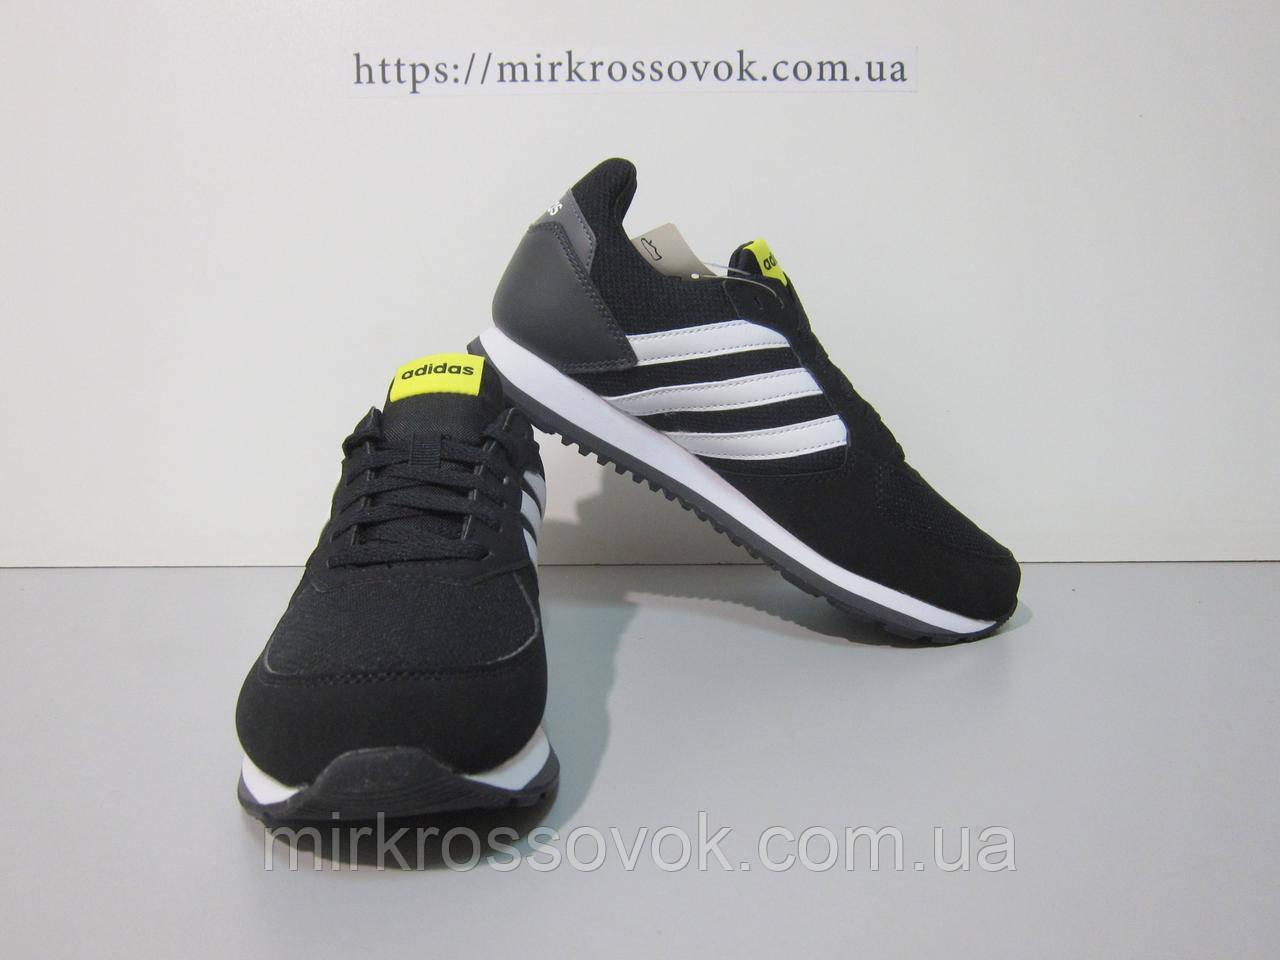 Insignia medio acuerdo  Кроссовки Adidas 8K ( B75735 ) (оригинал), цена 1190 грн., купить в Полтаве  — Prom.ua (ID#964019622)